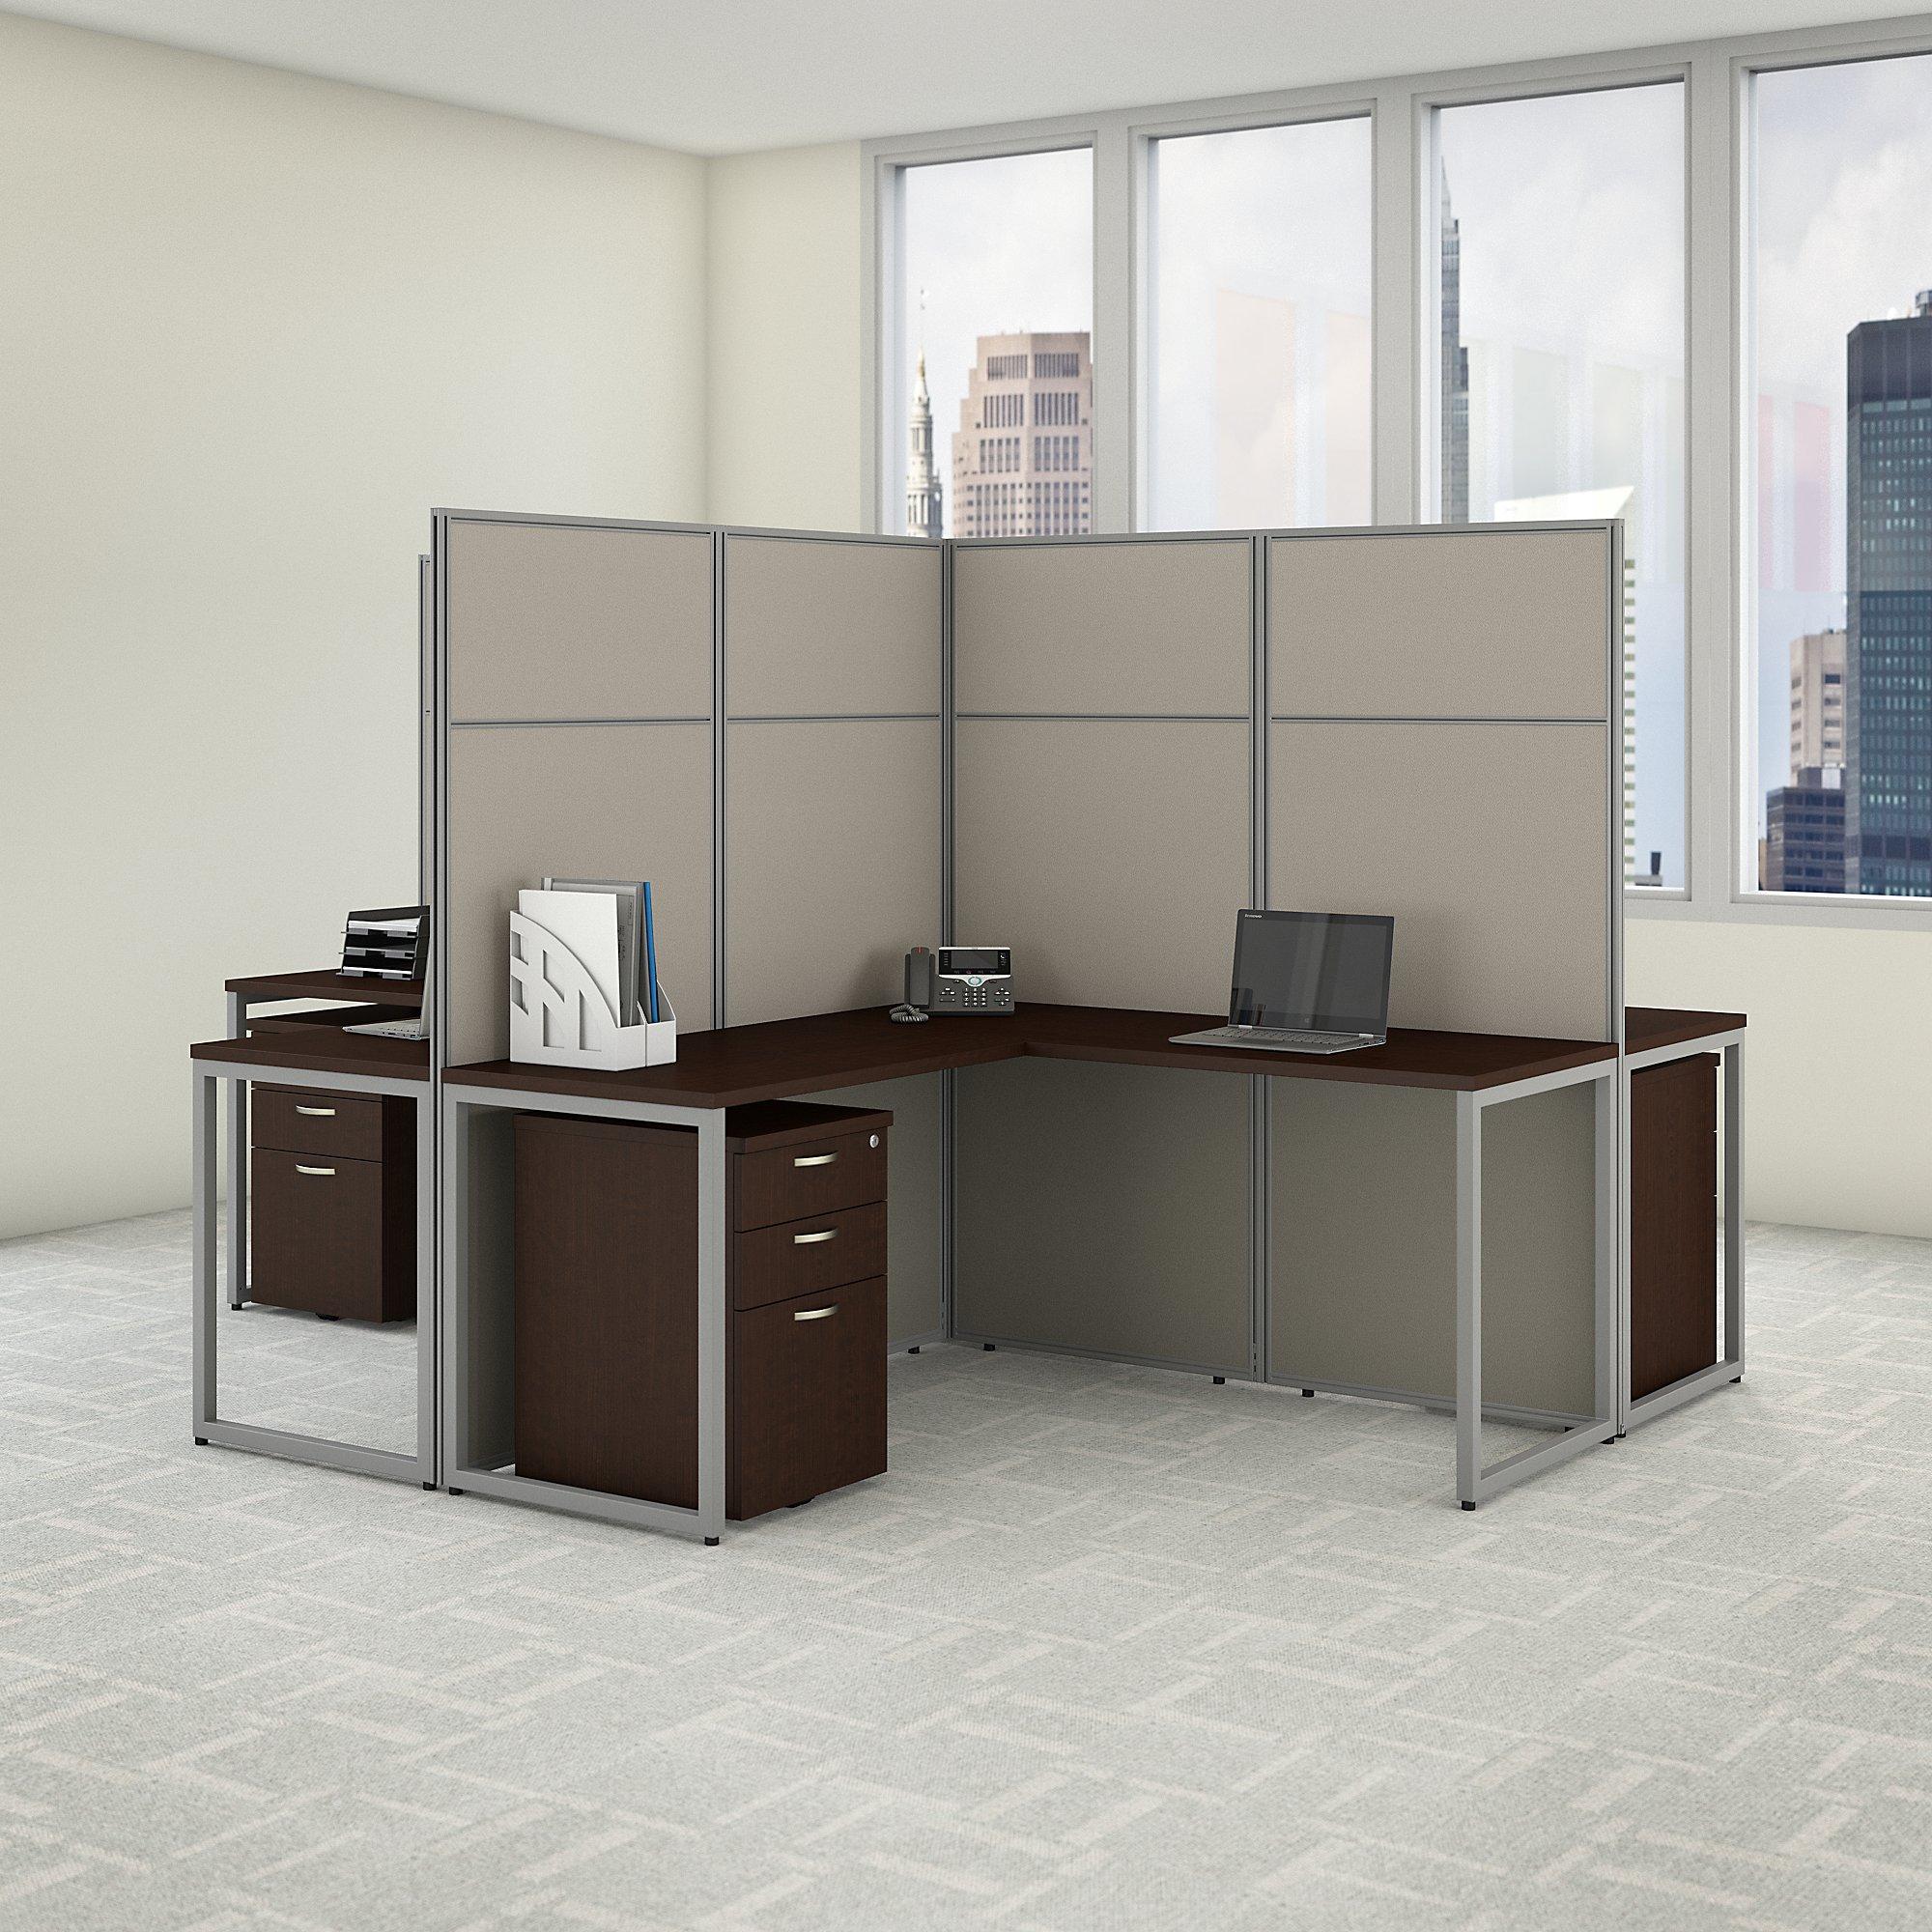 easy office 4 person cluster desk in mocha cherry